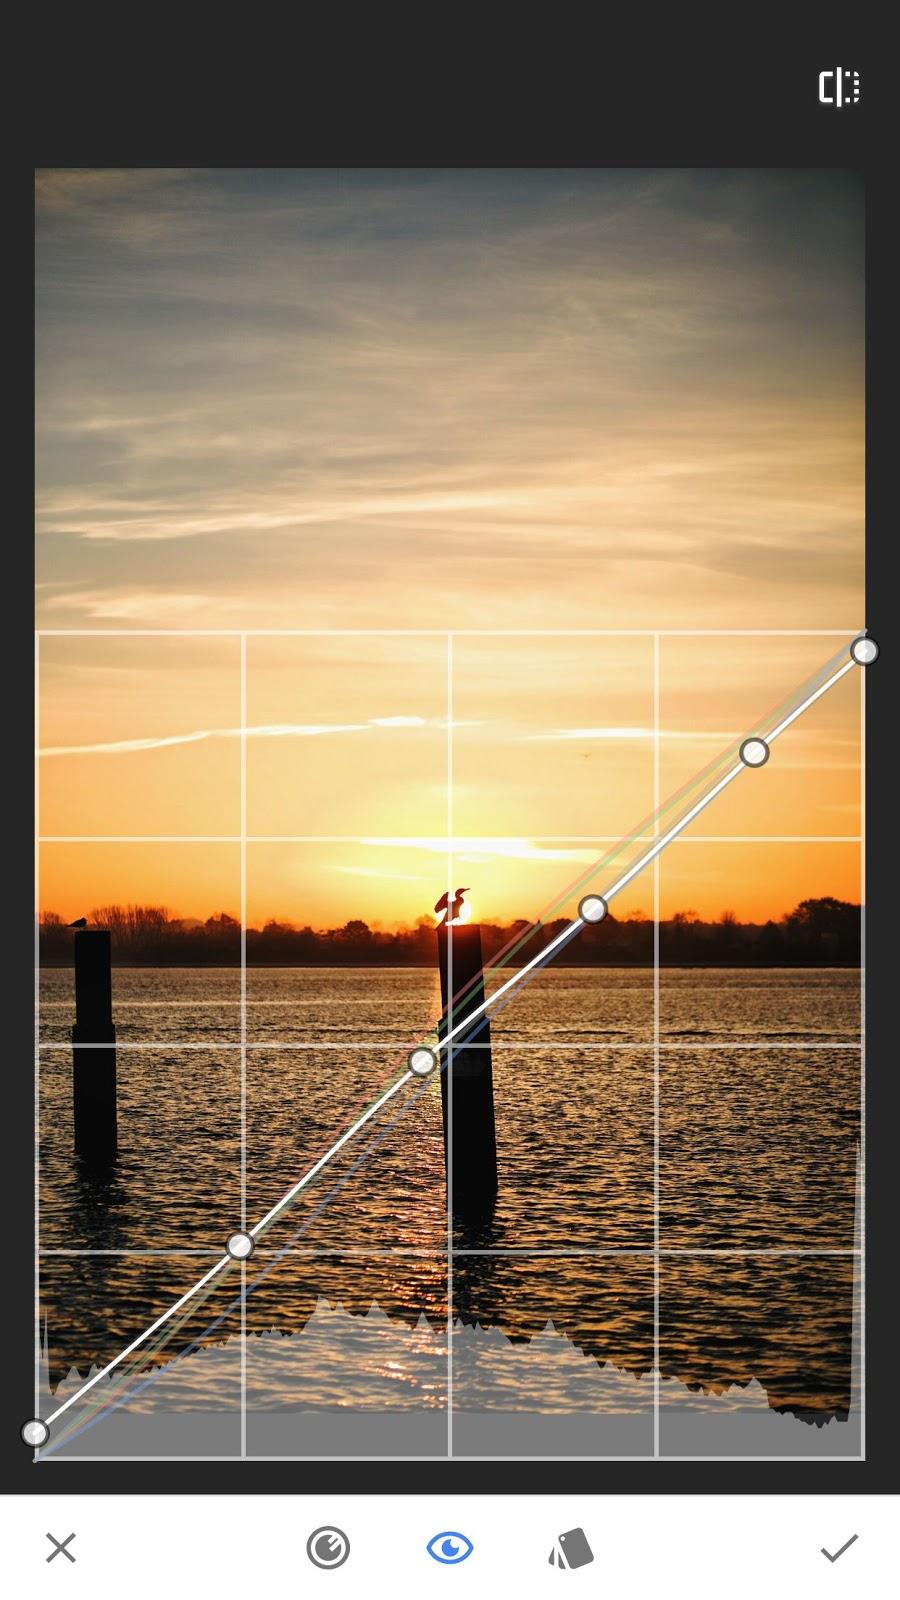 APK] Snapseed v2 15 Brings New Curves Tool, Improved Multi